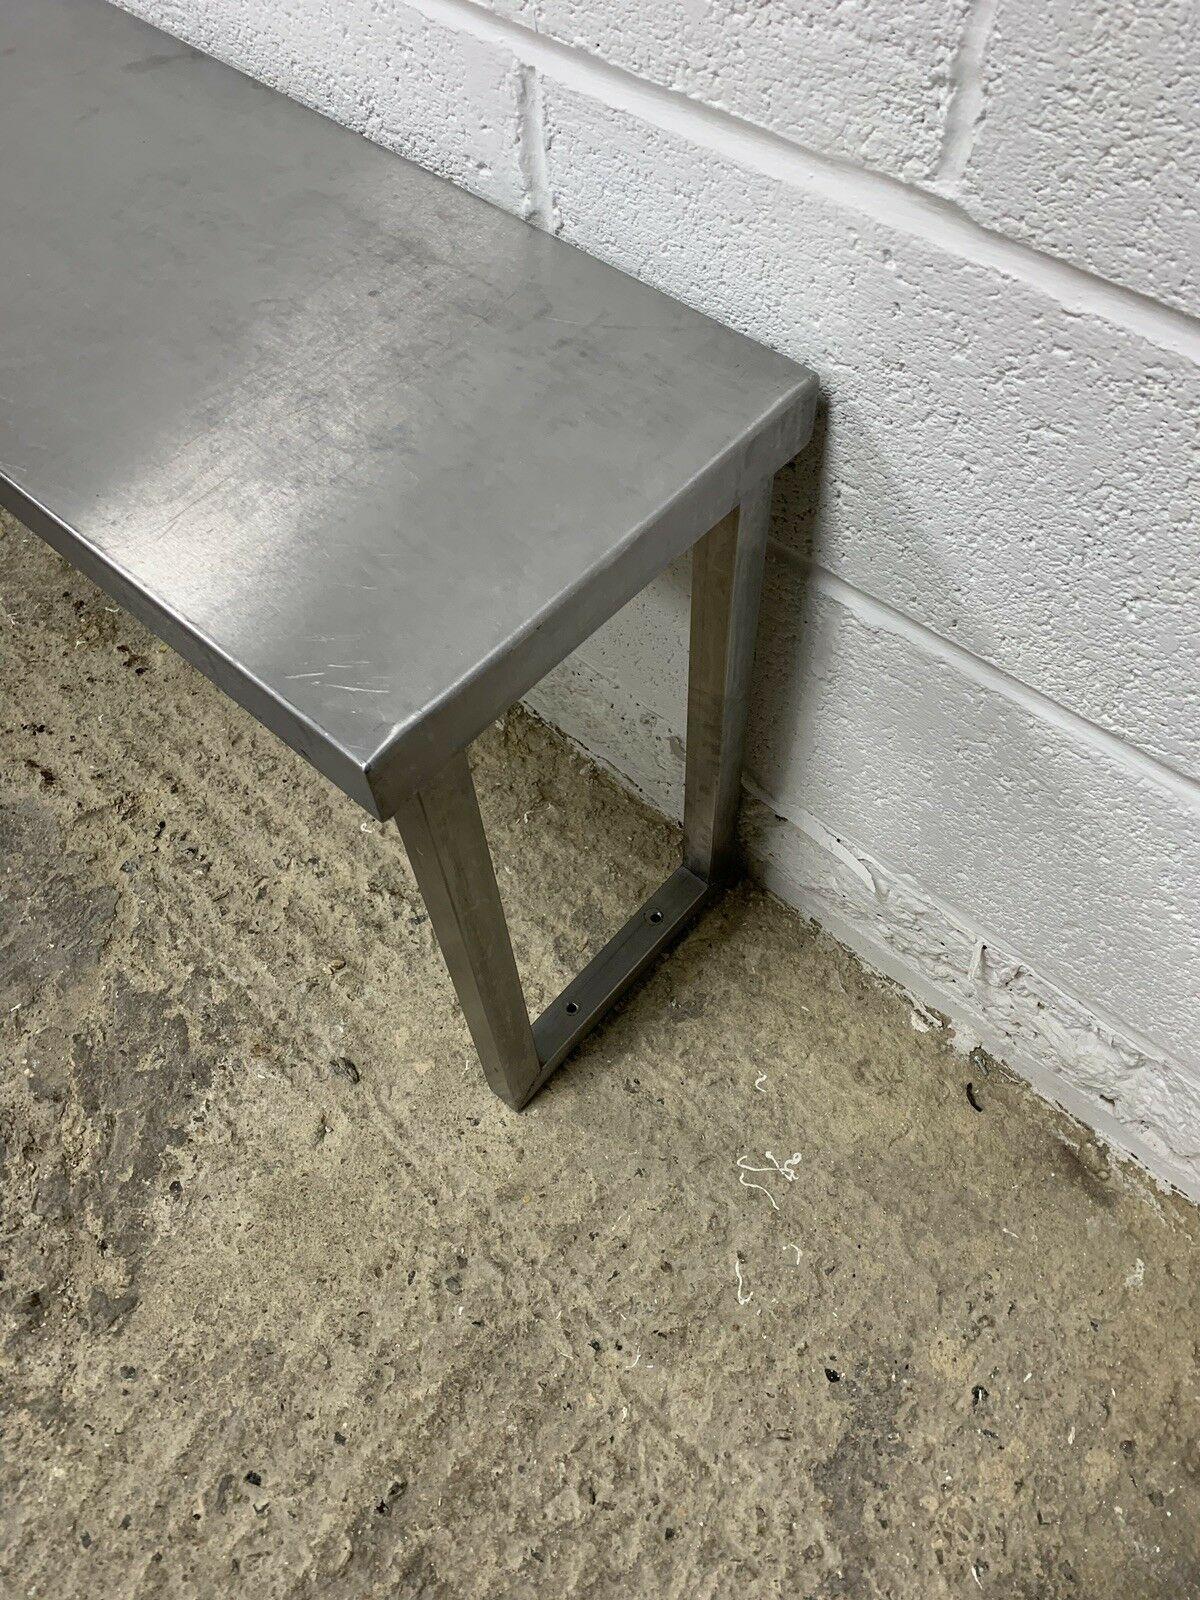 Stainless Steel Gantry - Image 4 of 4